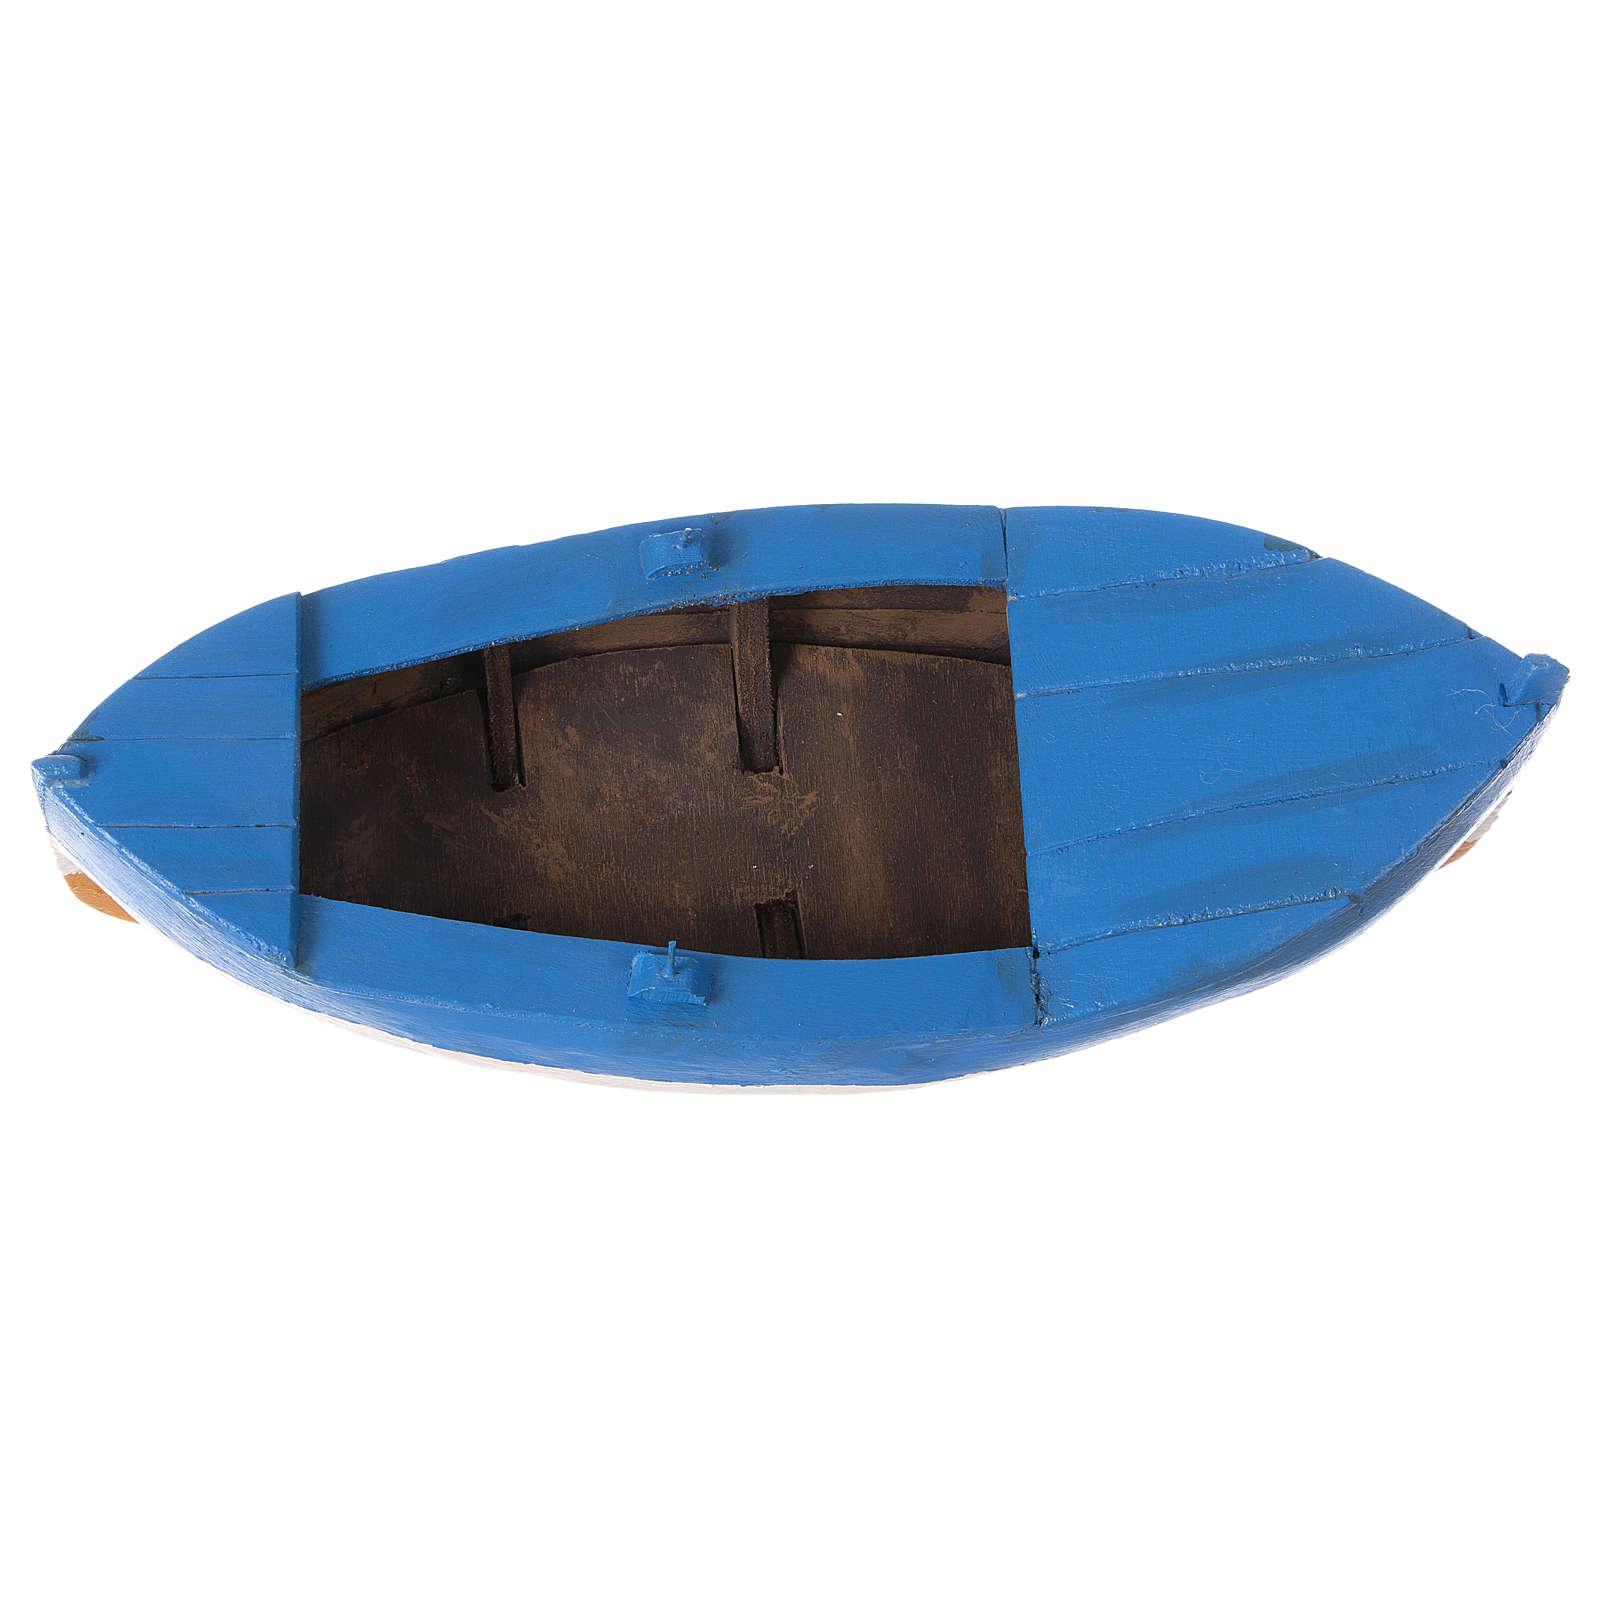 Small boat in wood for Nativity Scene 12 cm 4